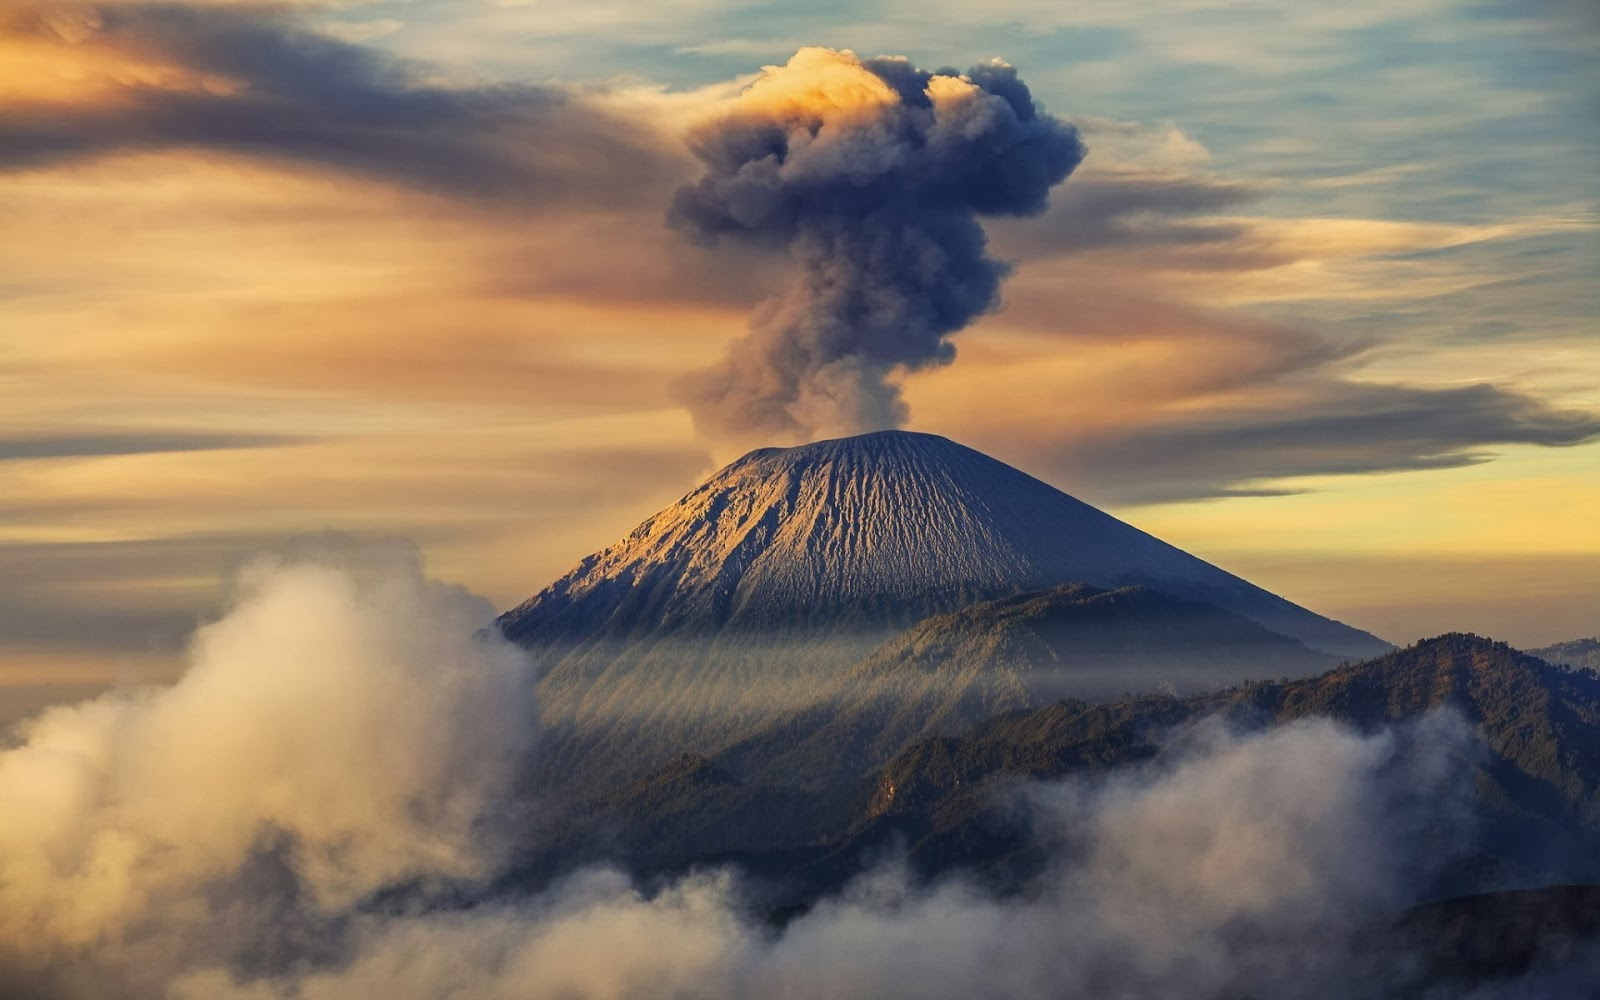 Gunung Semeru Erupsi Wisatawan Pendaki Diminta Hati Hati Portal Berita Bisnis Wisata